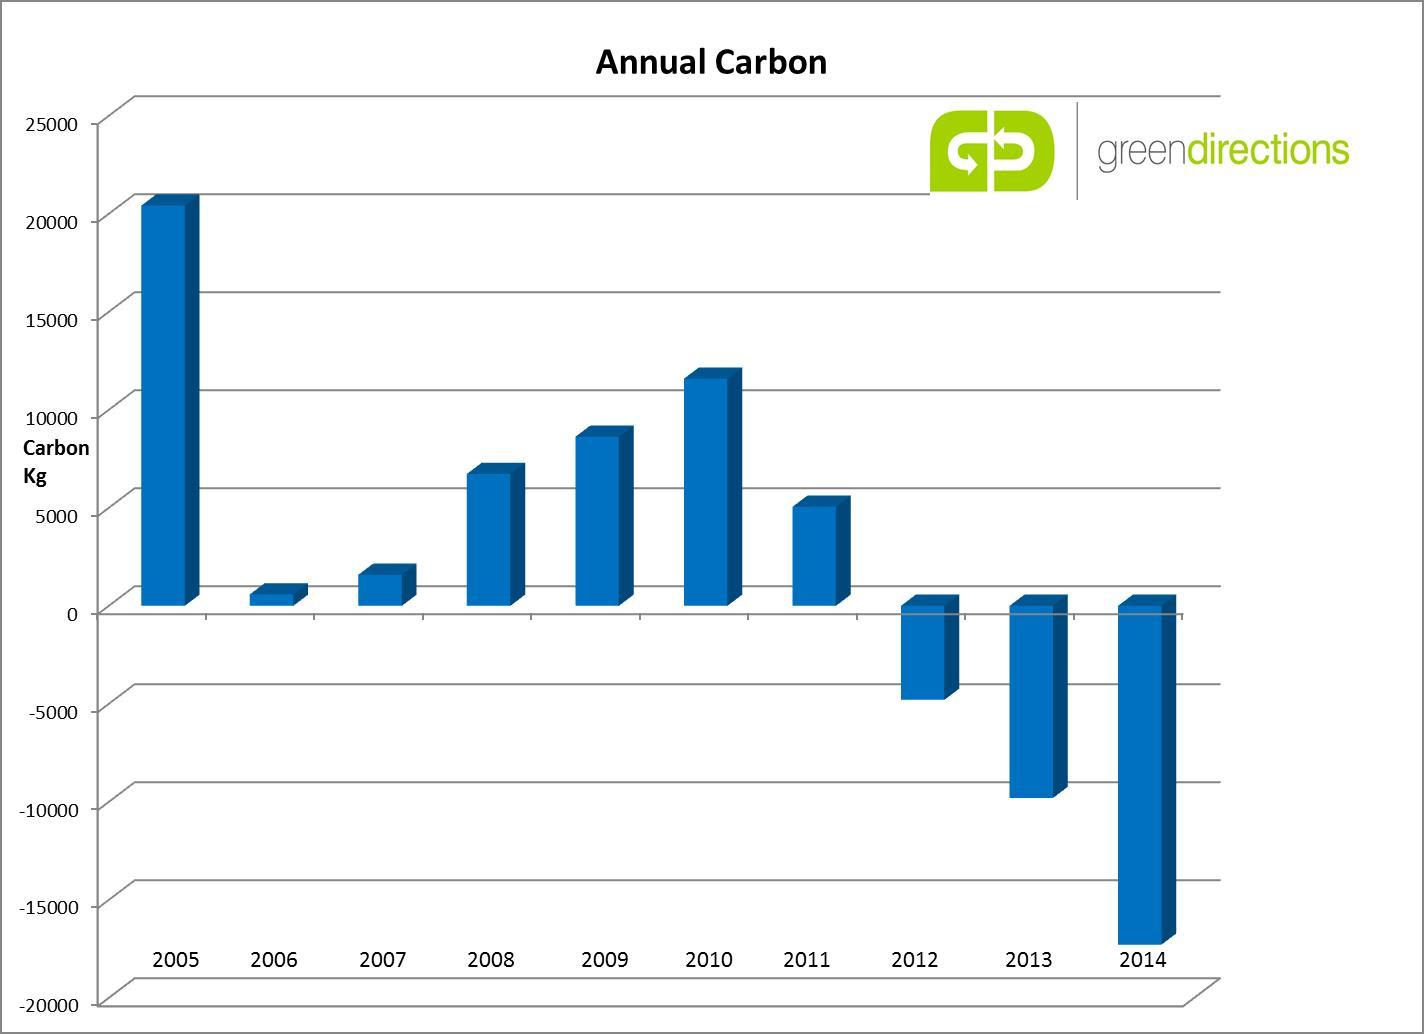 http://www.greendirections.co.uk/uploads/images/Annual%20Carbon.jpg